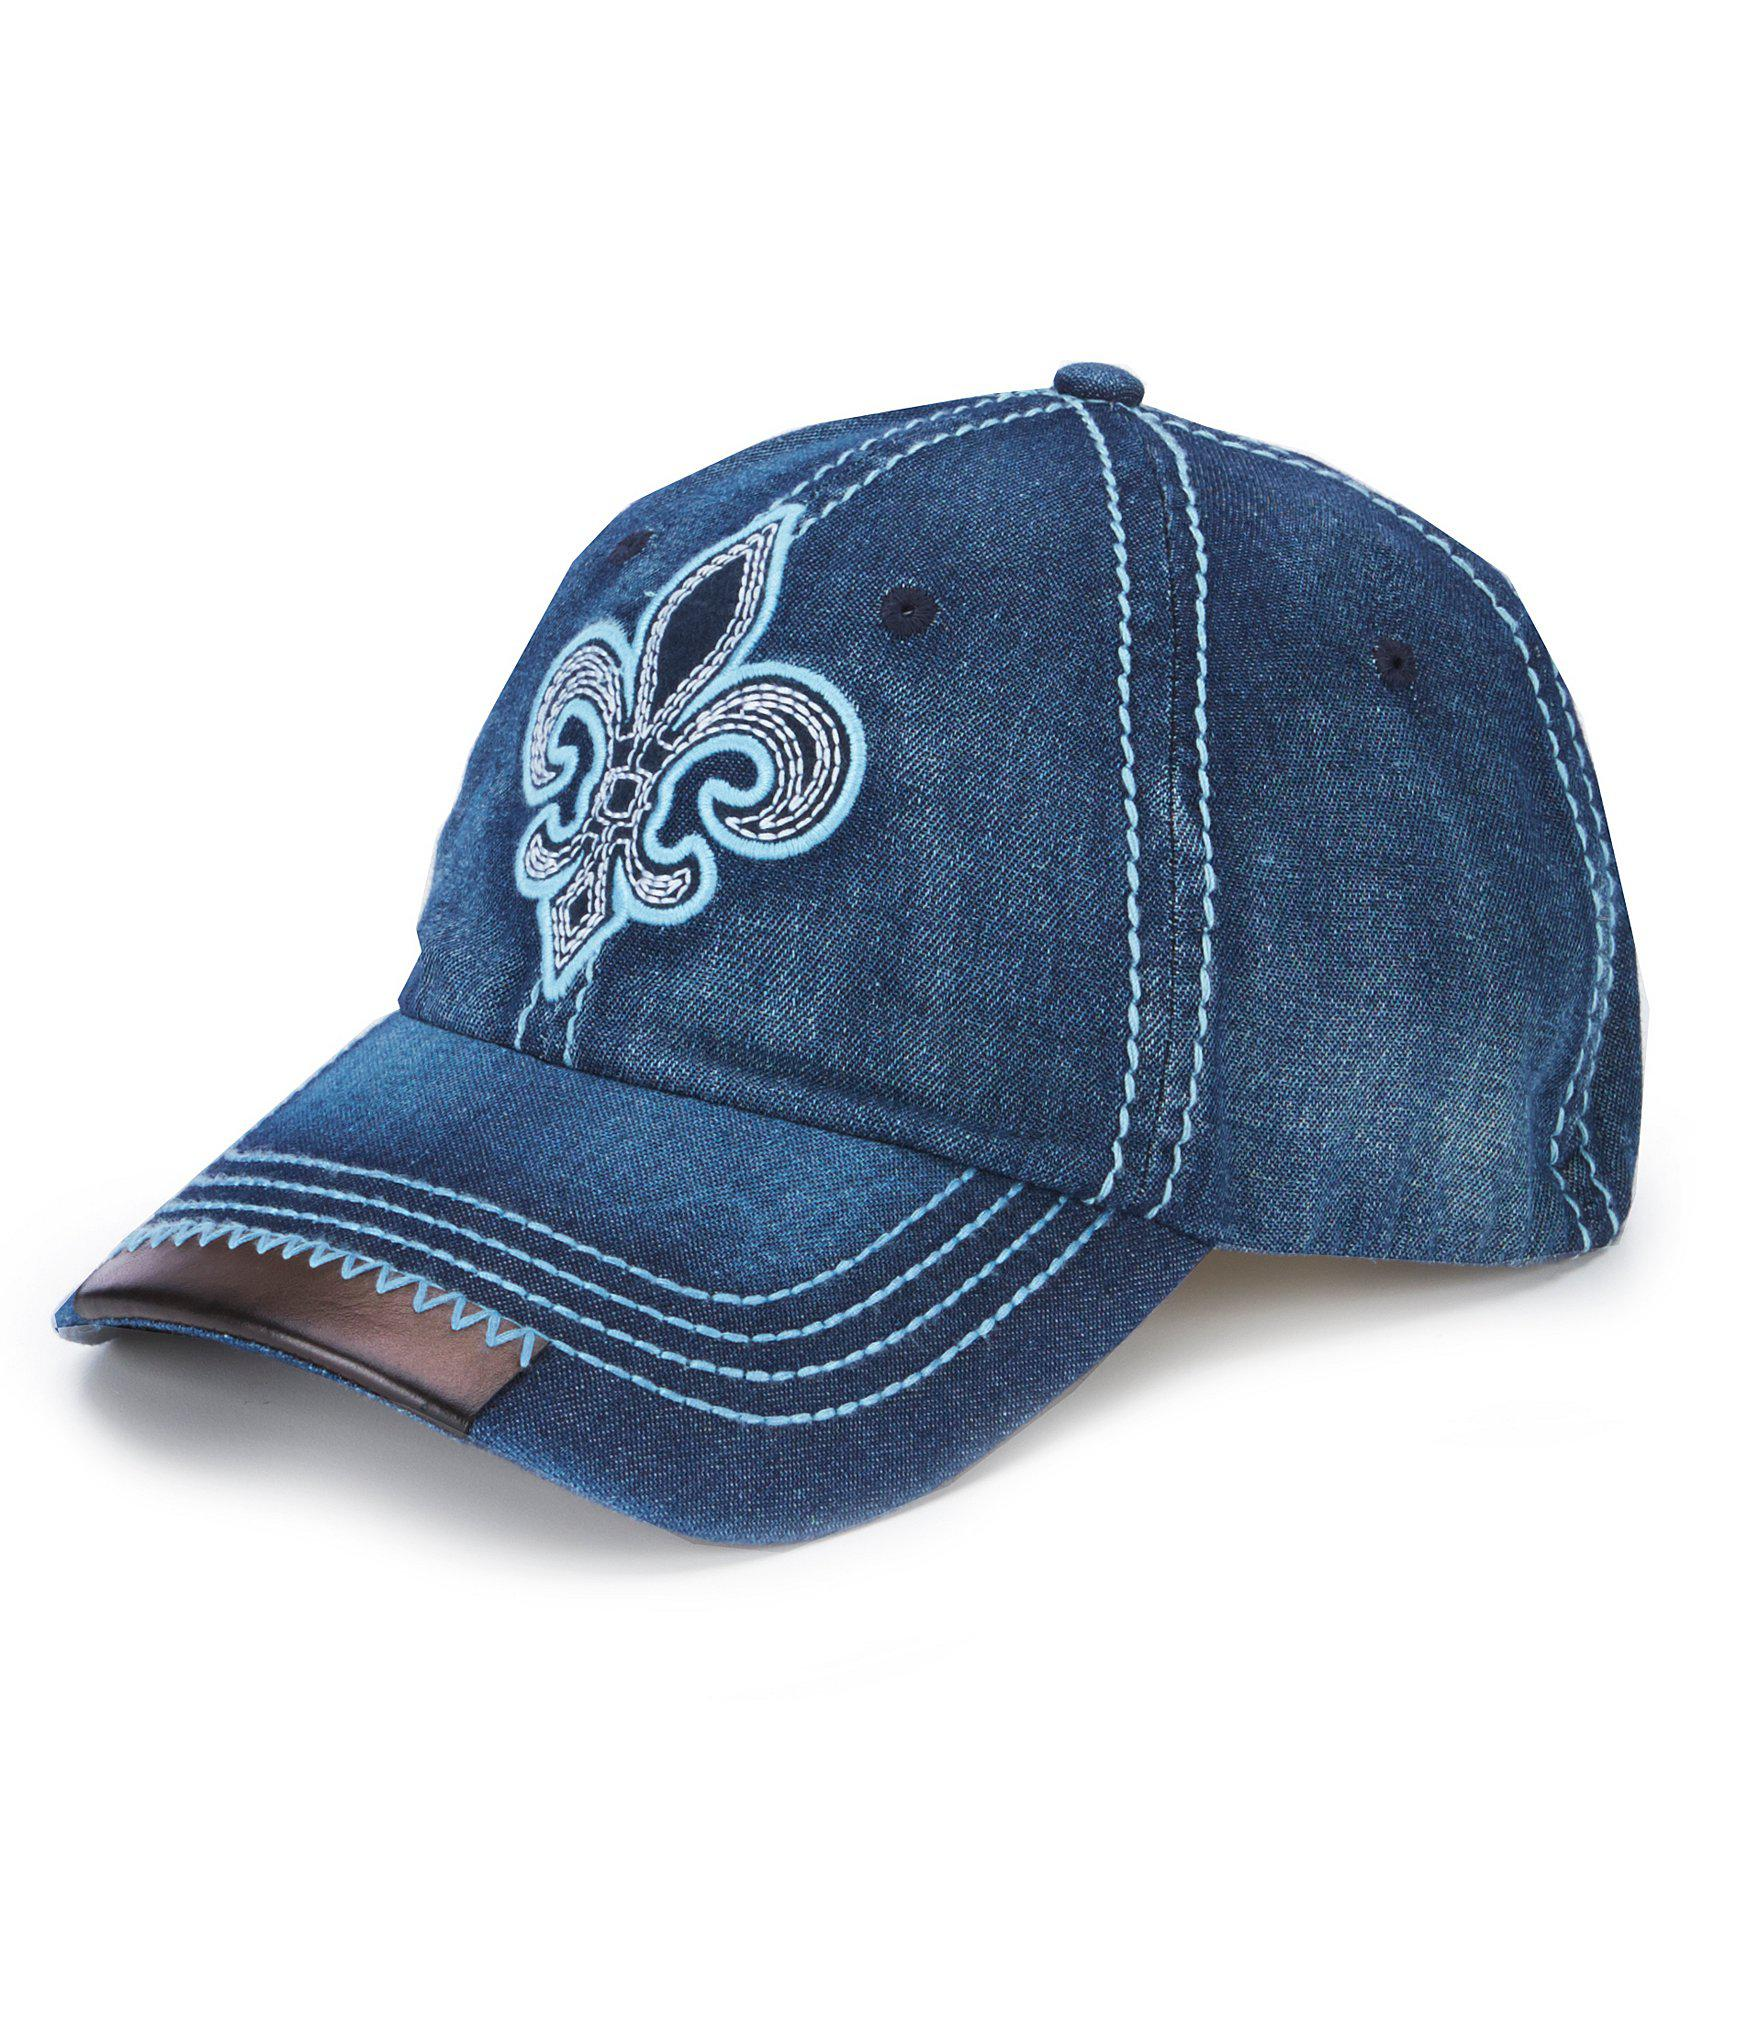 promo code 22435 a6cb8 Lyst - Cremieux Jeans Patch Denim Baseball Cap in Blue for Men